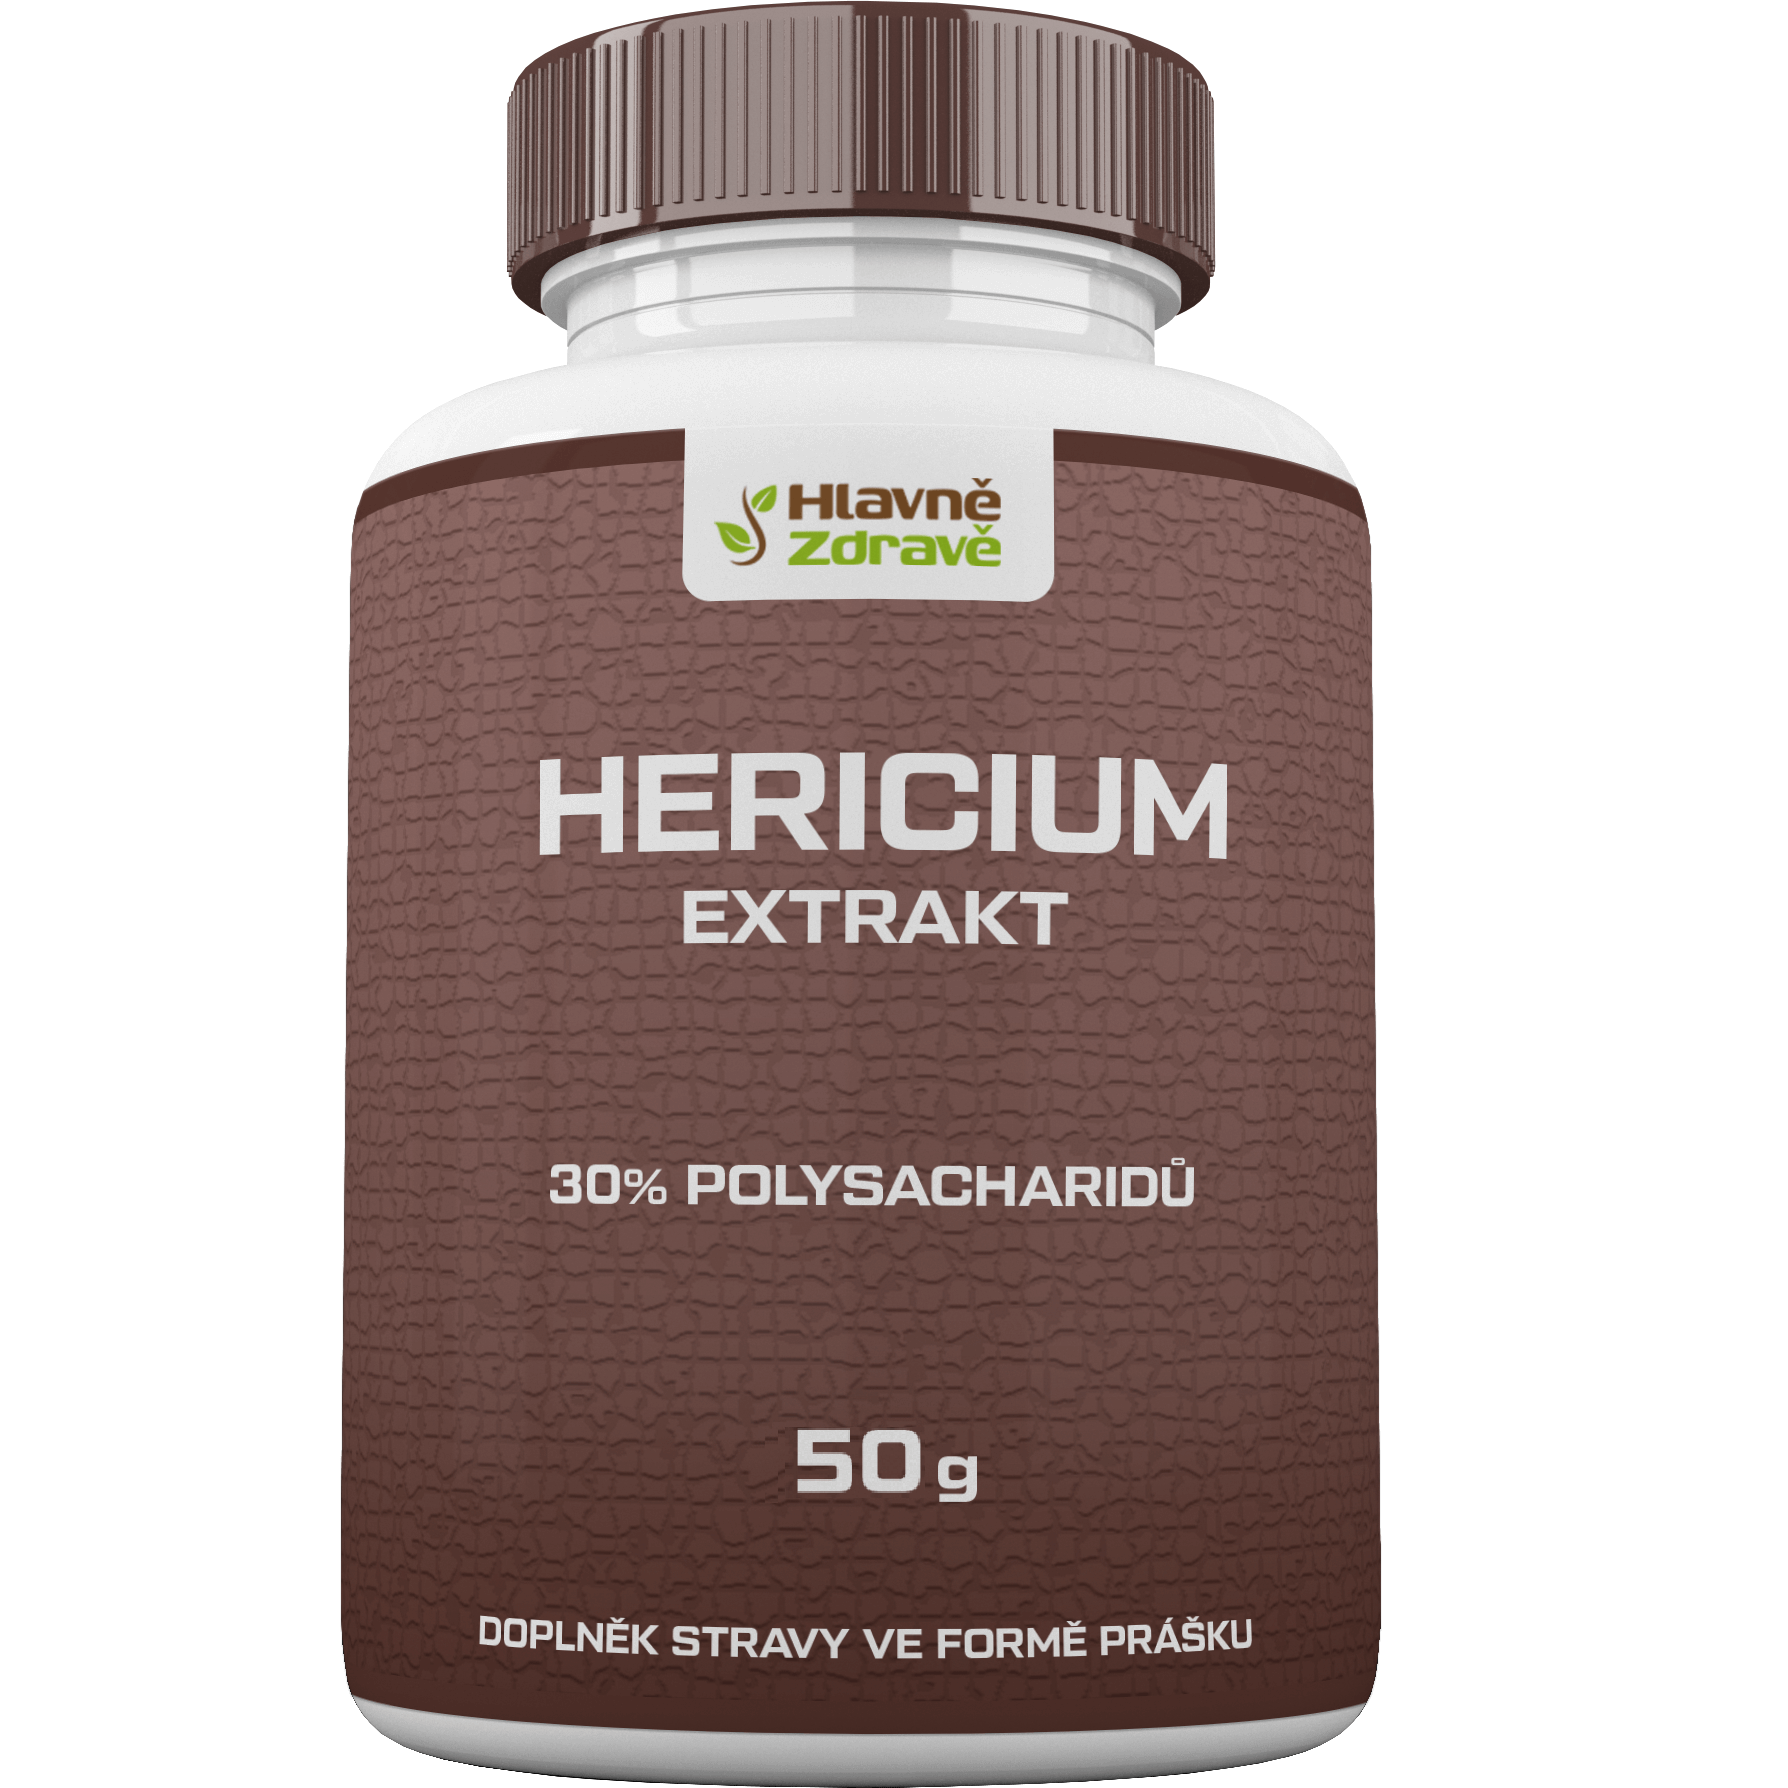 hericium extrakt prasek 30% polysacharidů 50g